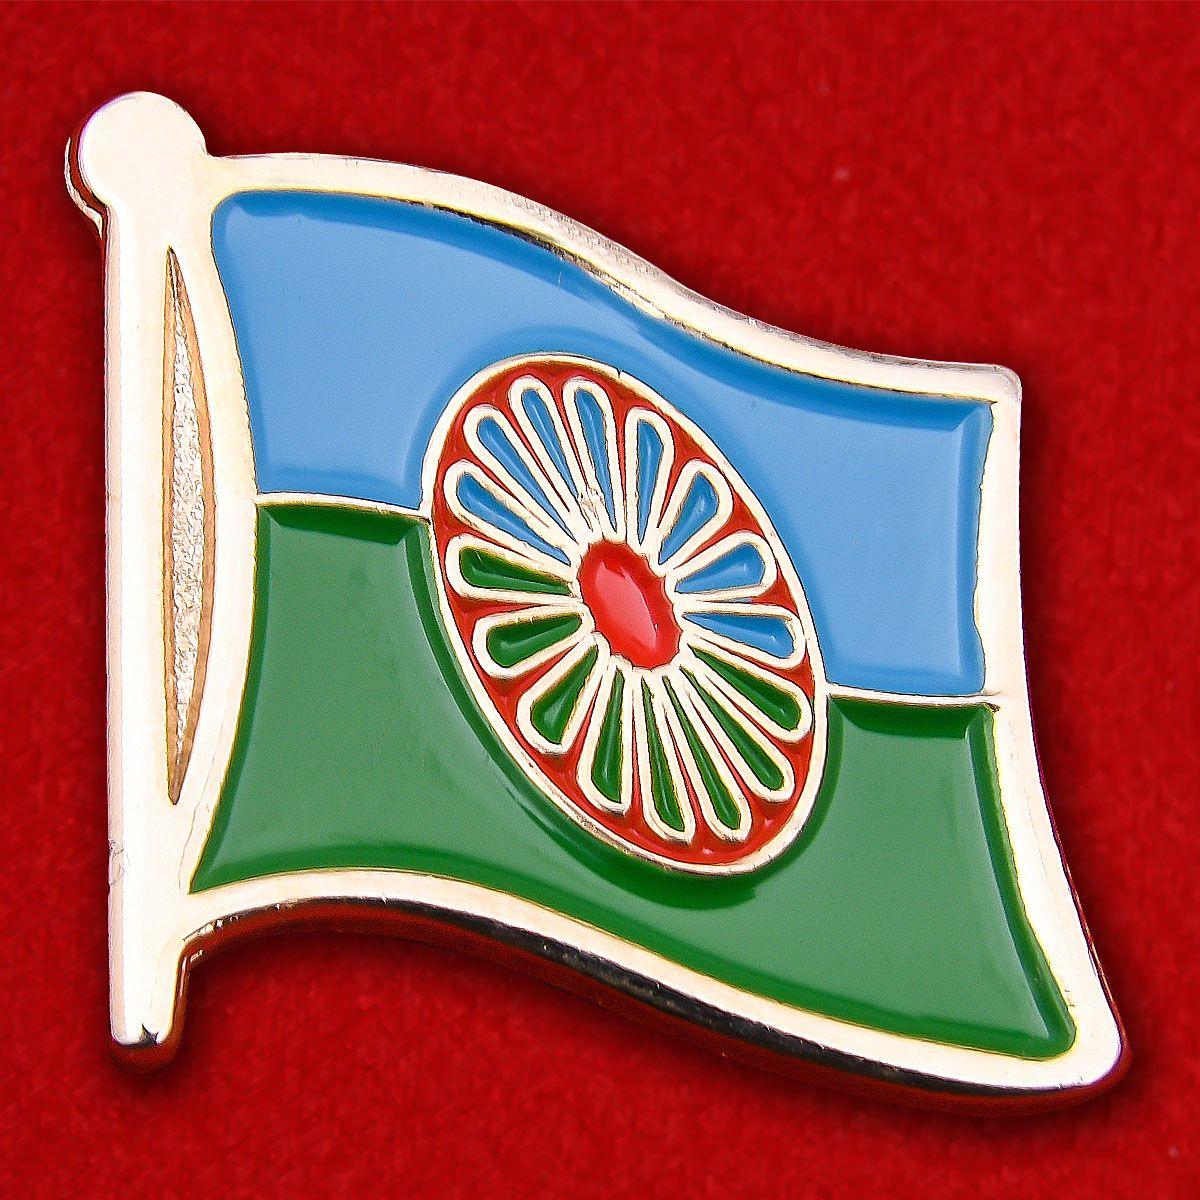 Значок Цыганского флага